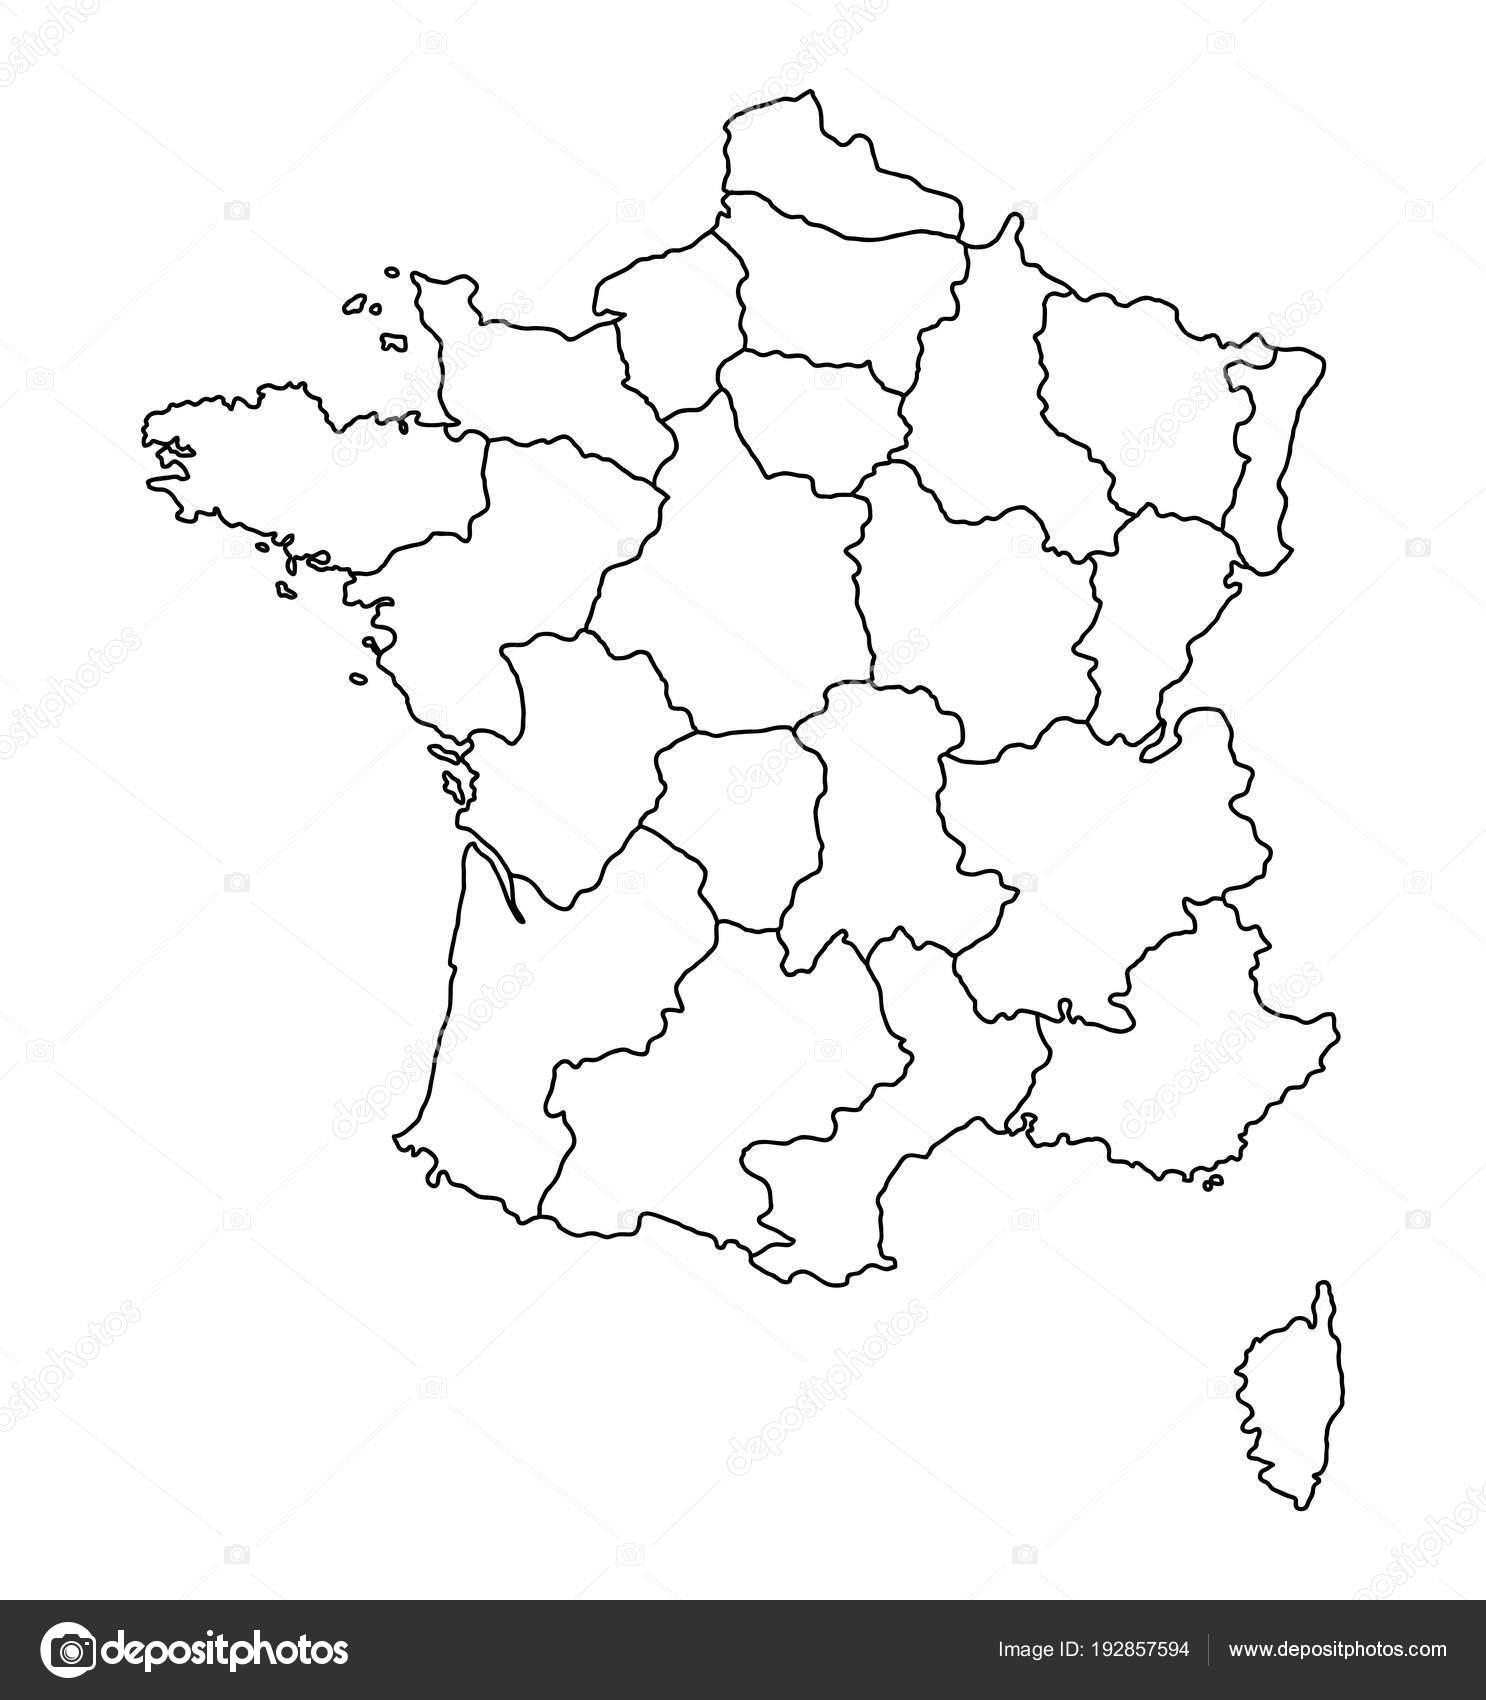 Outline Of Map Of France.Outline Map France Stock Vector C Blacklava36 192857594